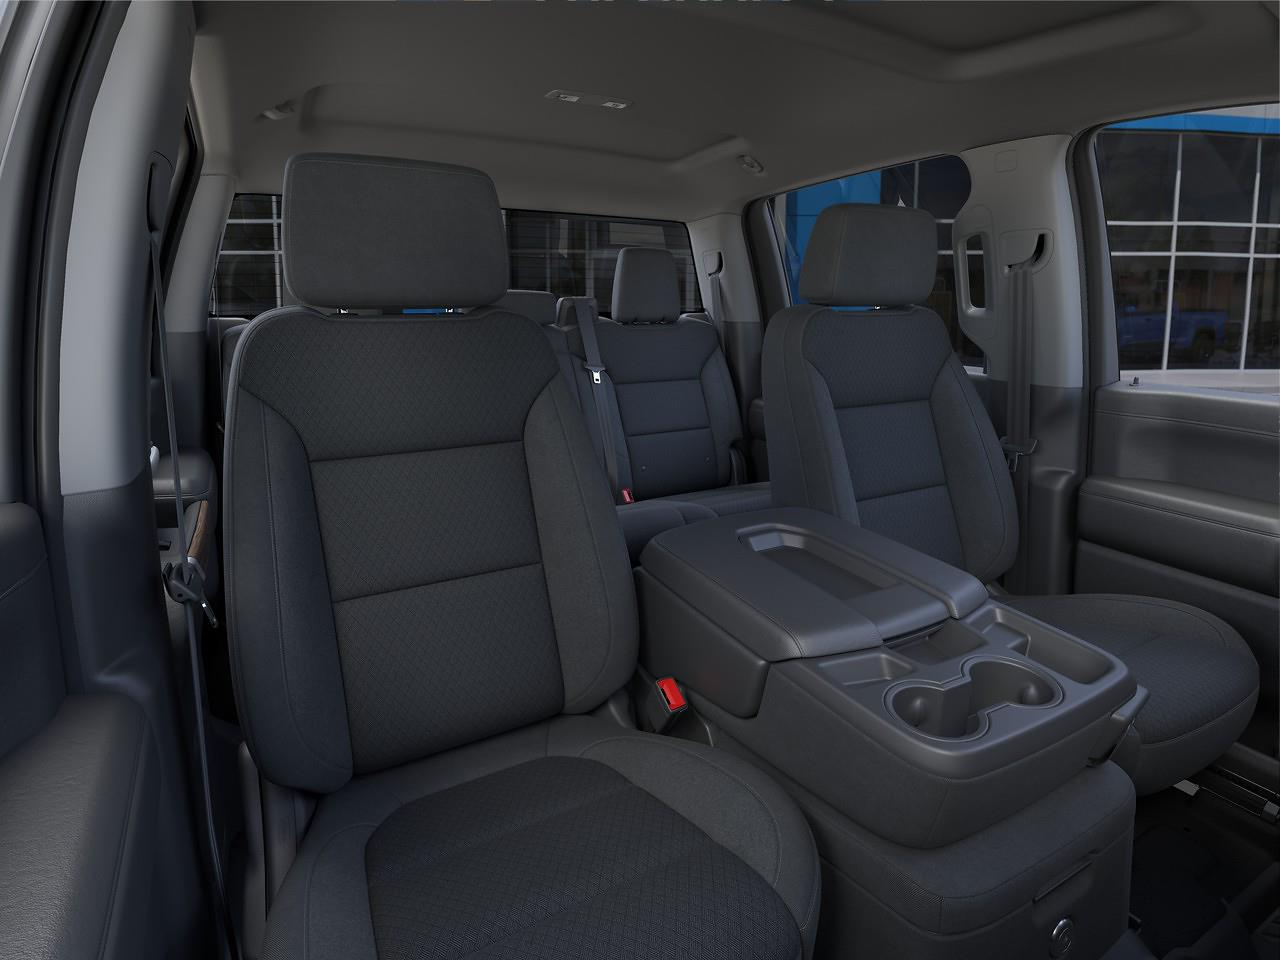 2021 Chevrolet Silverado 2500 Crew Cab 4x4, Pickup #150637 - photo 13